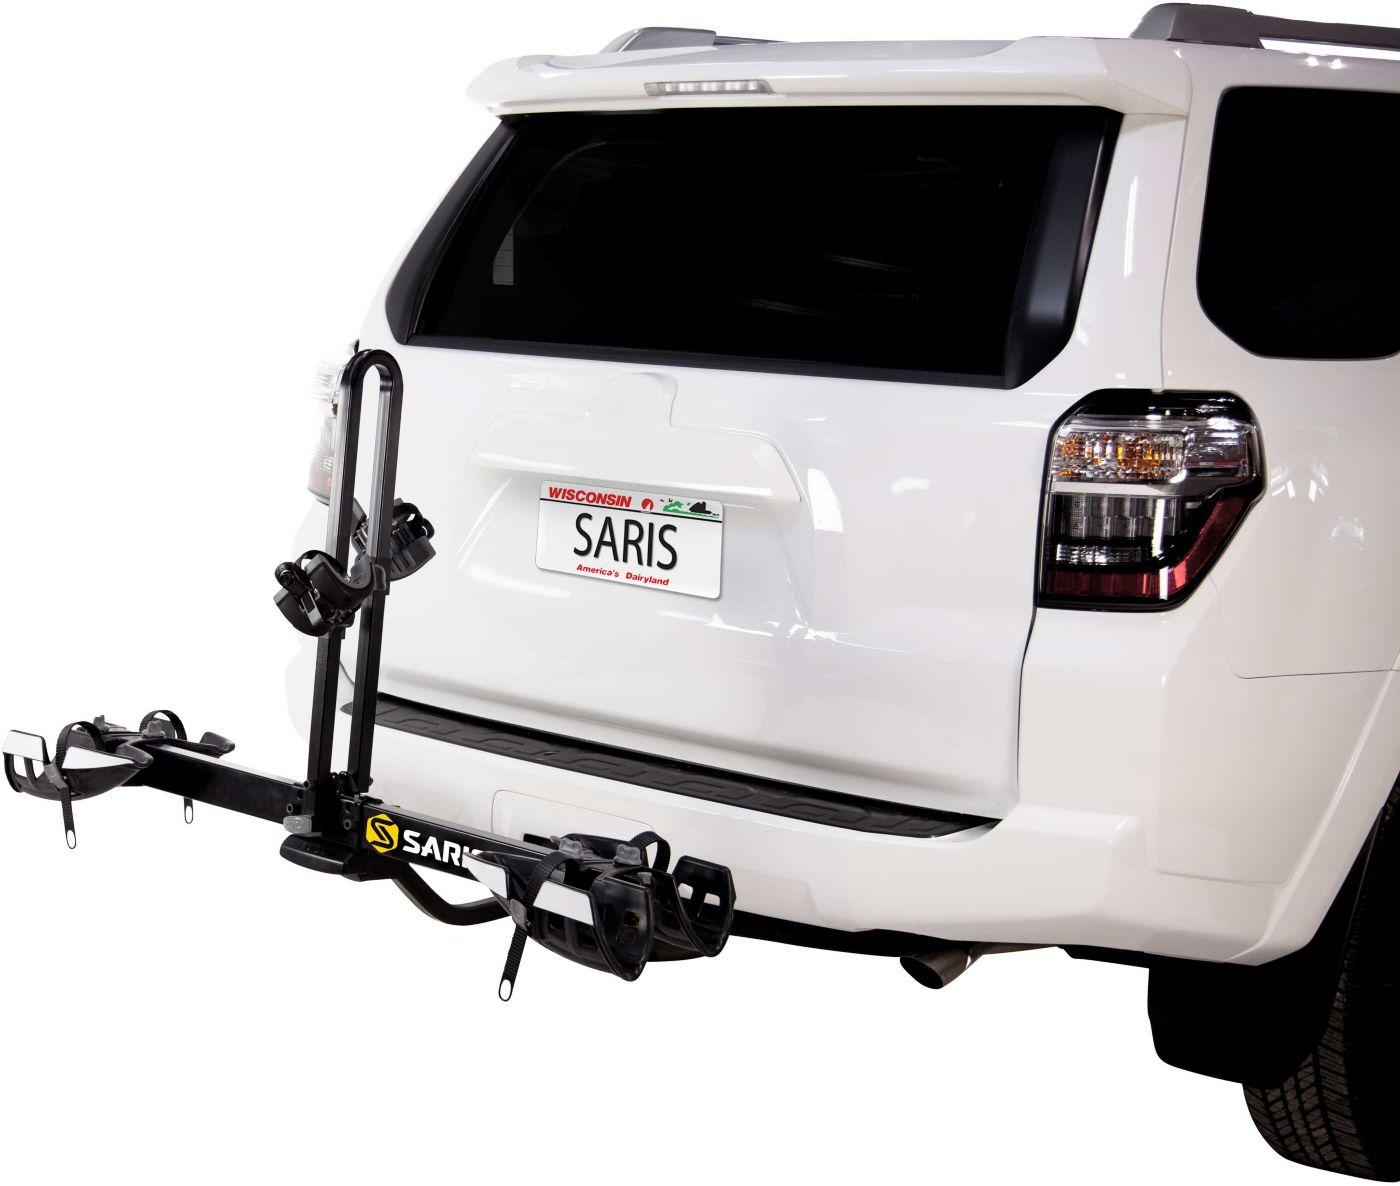 Saris Freedom EX Hitch Mount 2-Bike Rack